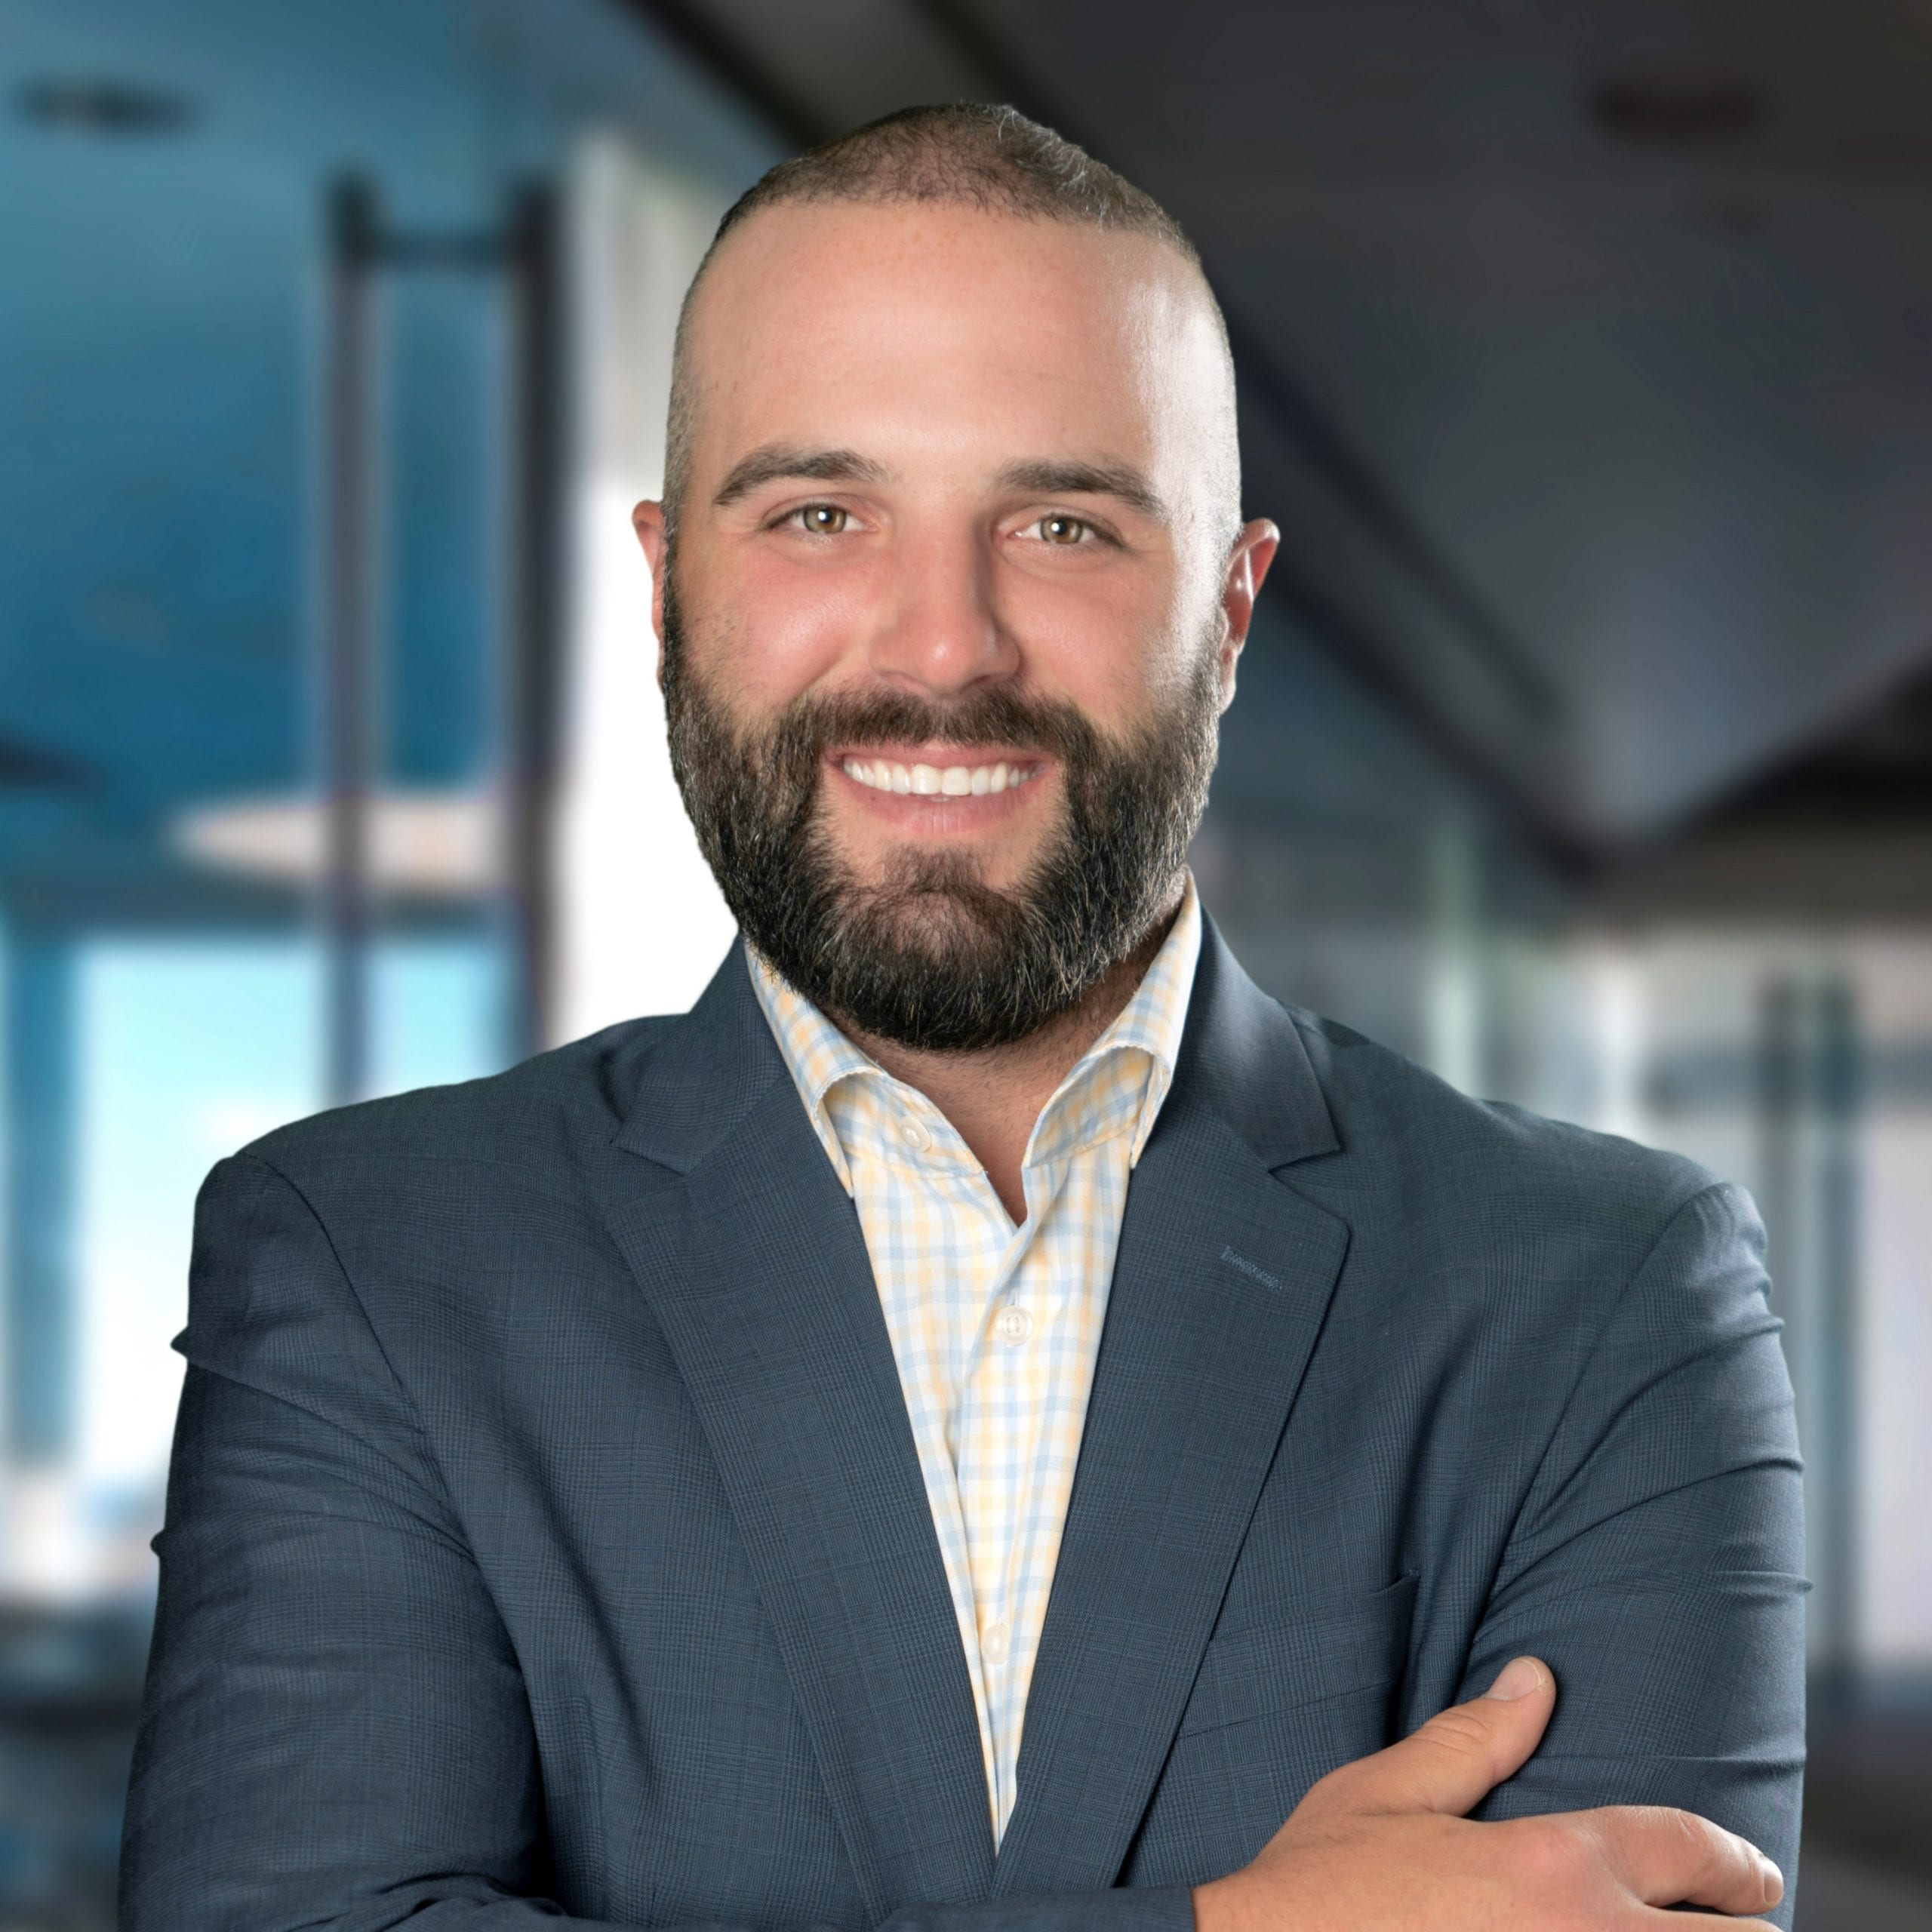 Patrick Oliverio